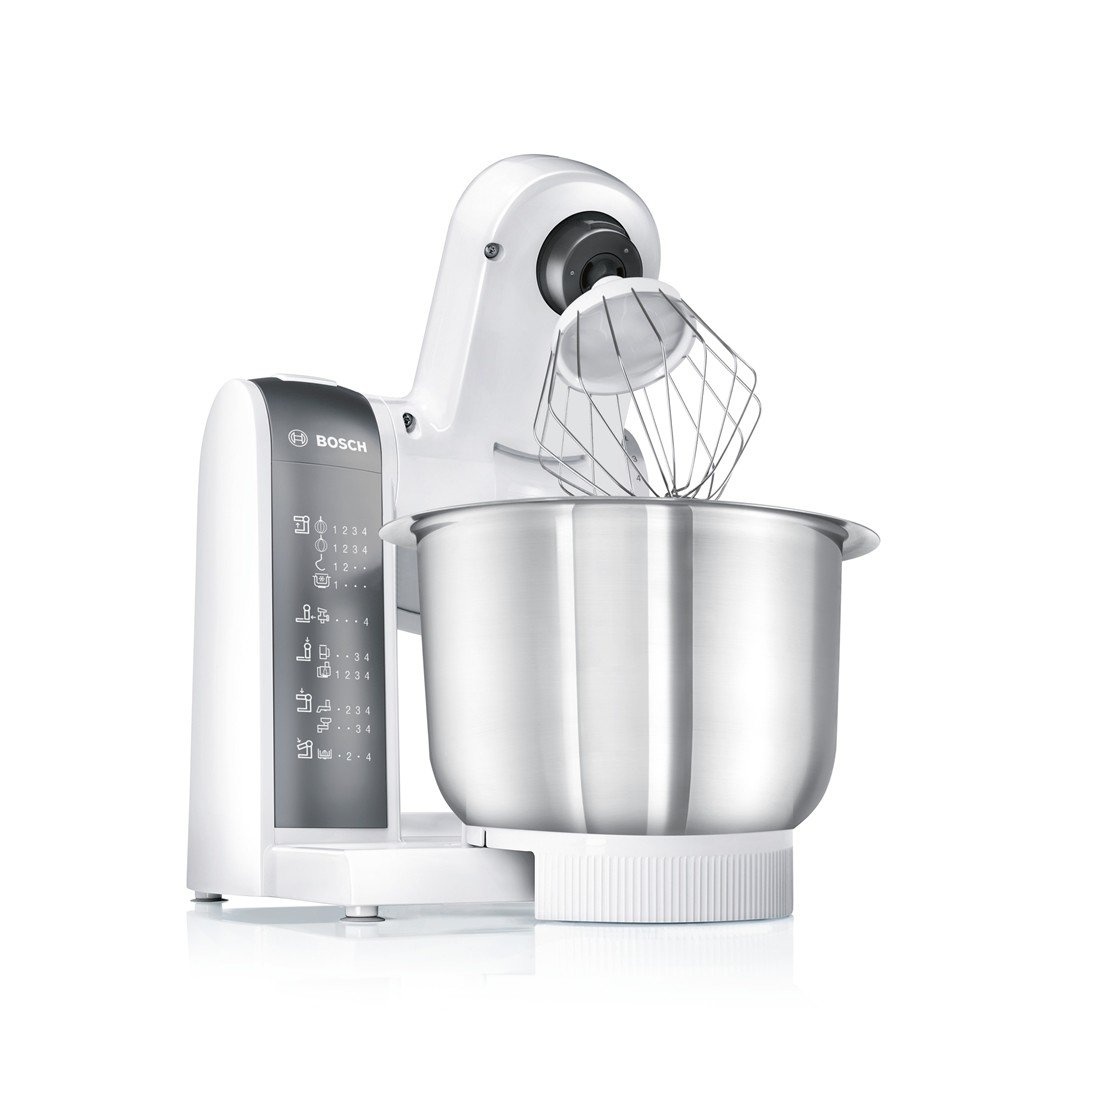 Amazon.de: Bosch MUM48120DE Küchenmaschine 600 W, 3, 9 L ...